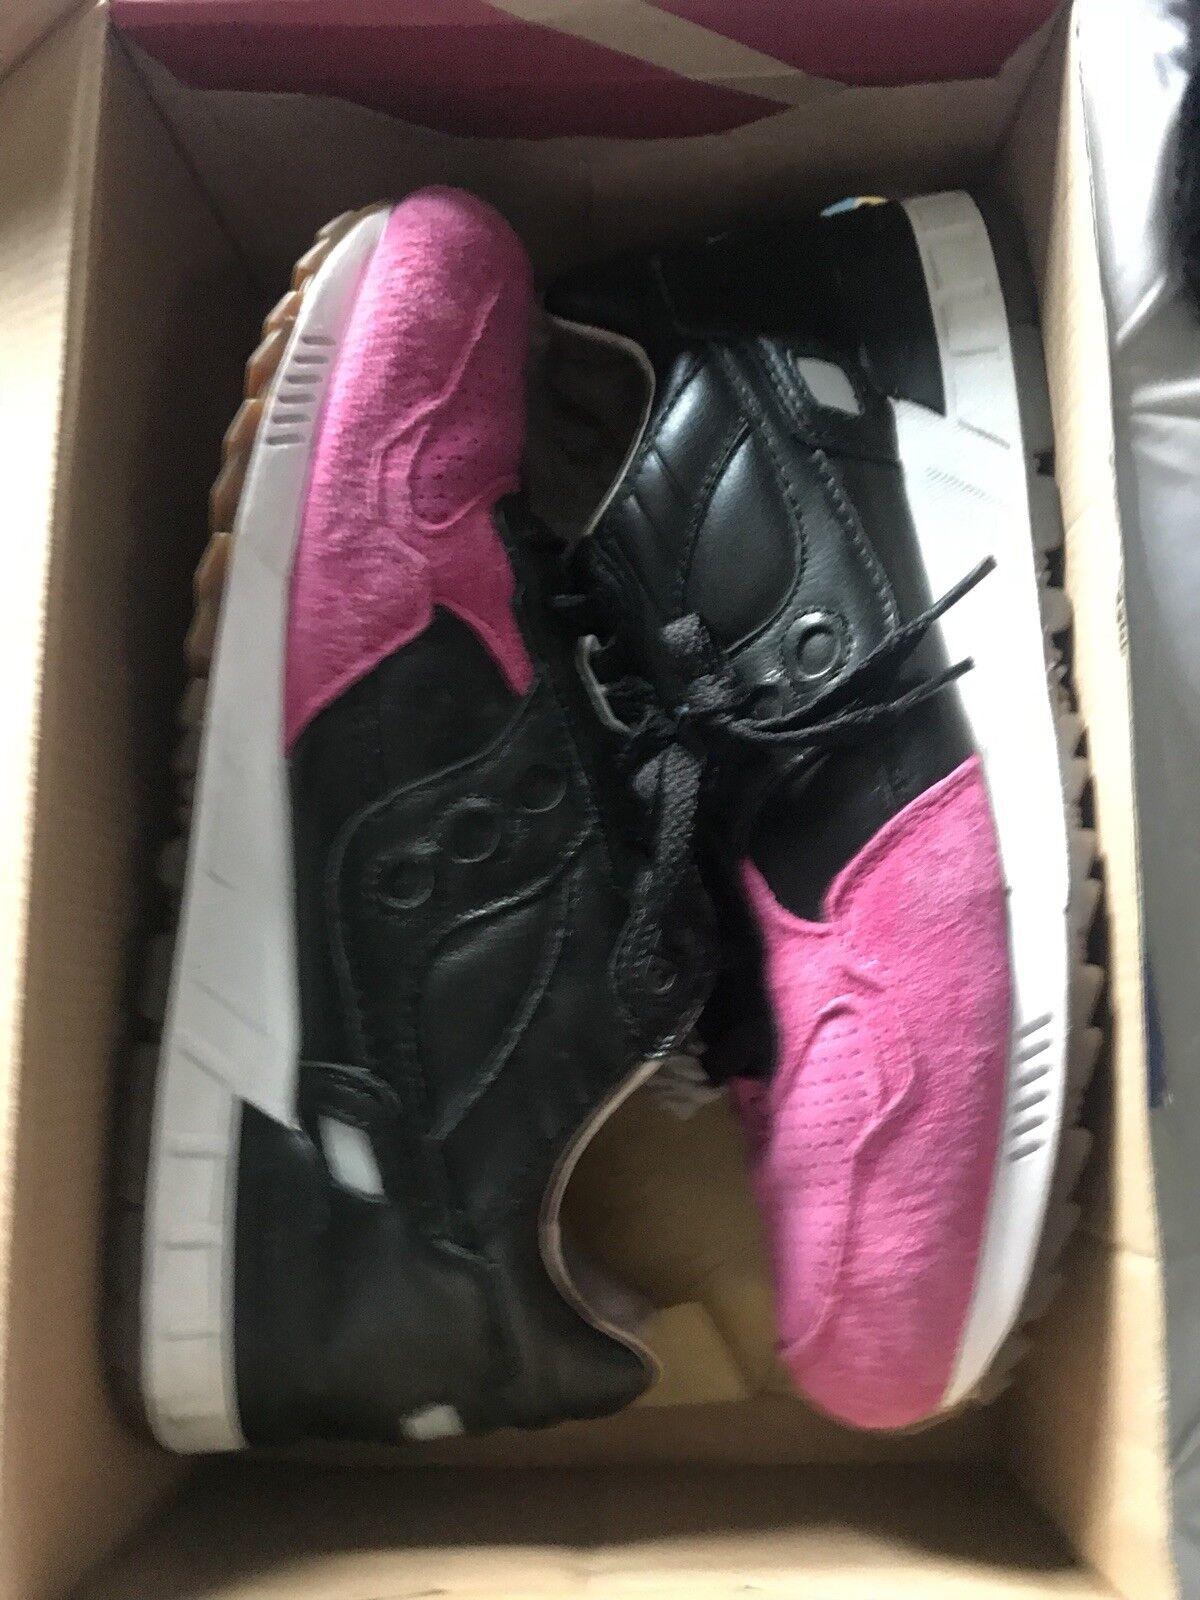 2012 Solebox x Saucony Shadow 5000  Pink Devil  - US Size 10 - RARE